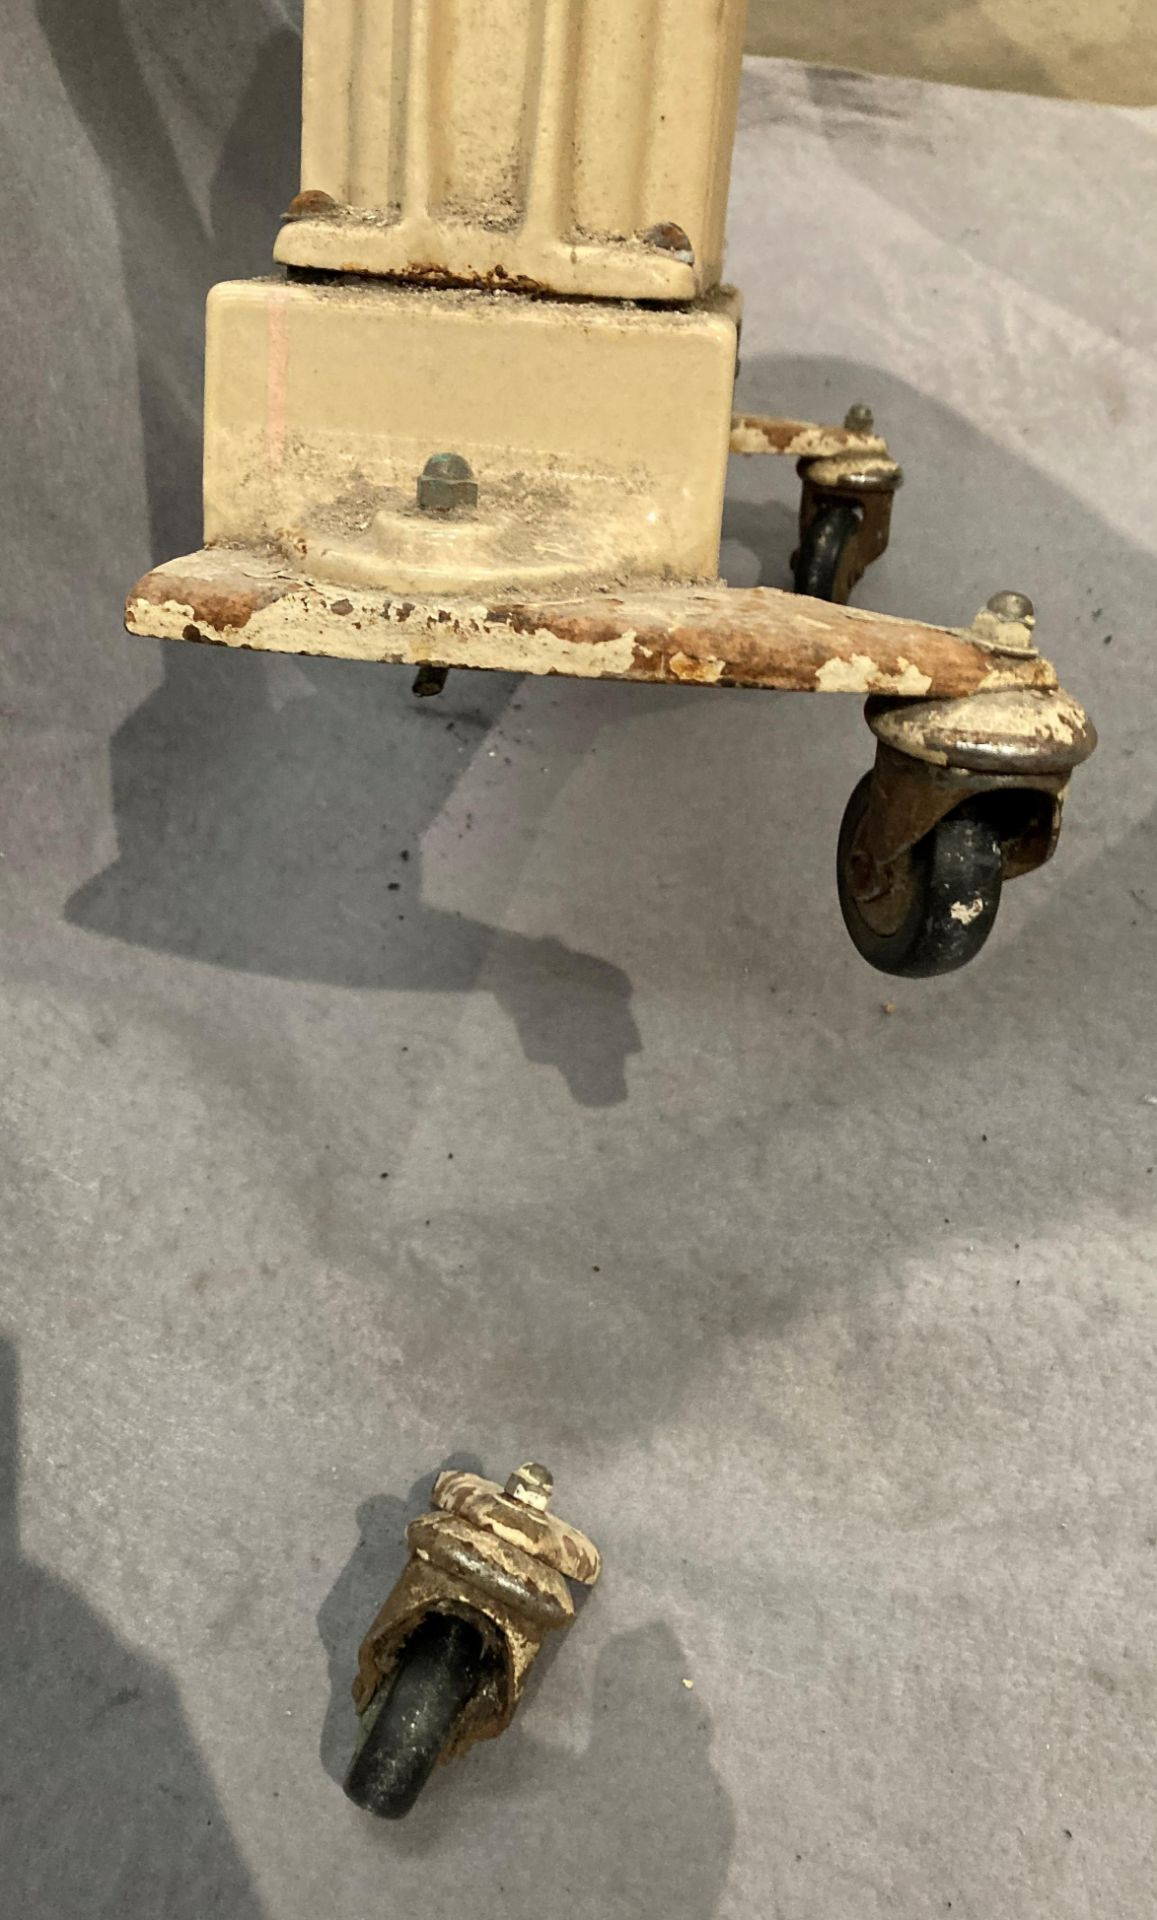 A Dry Denair cast iron mobile radiator 60 x 48cm wide - one cast castor broke off and electric - Image 5 of 5